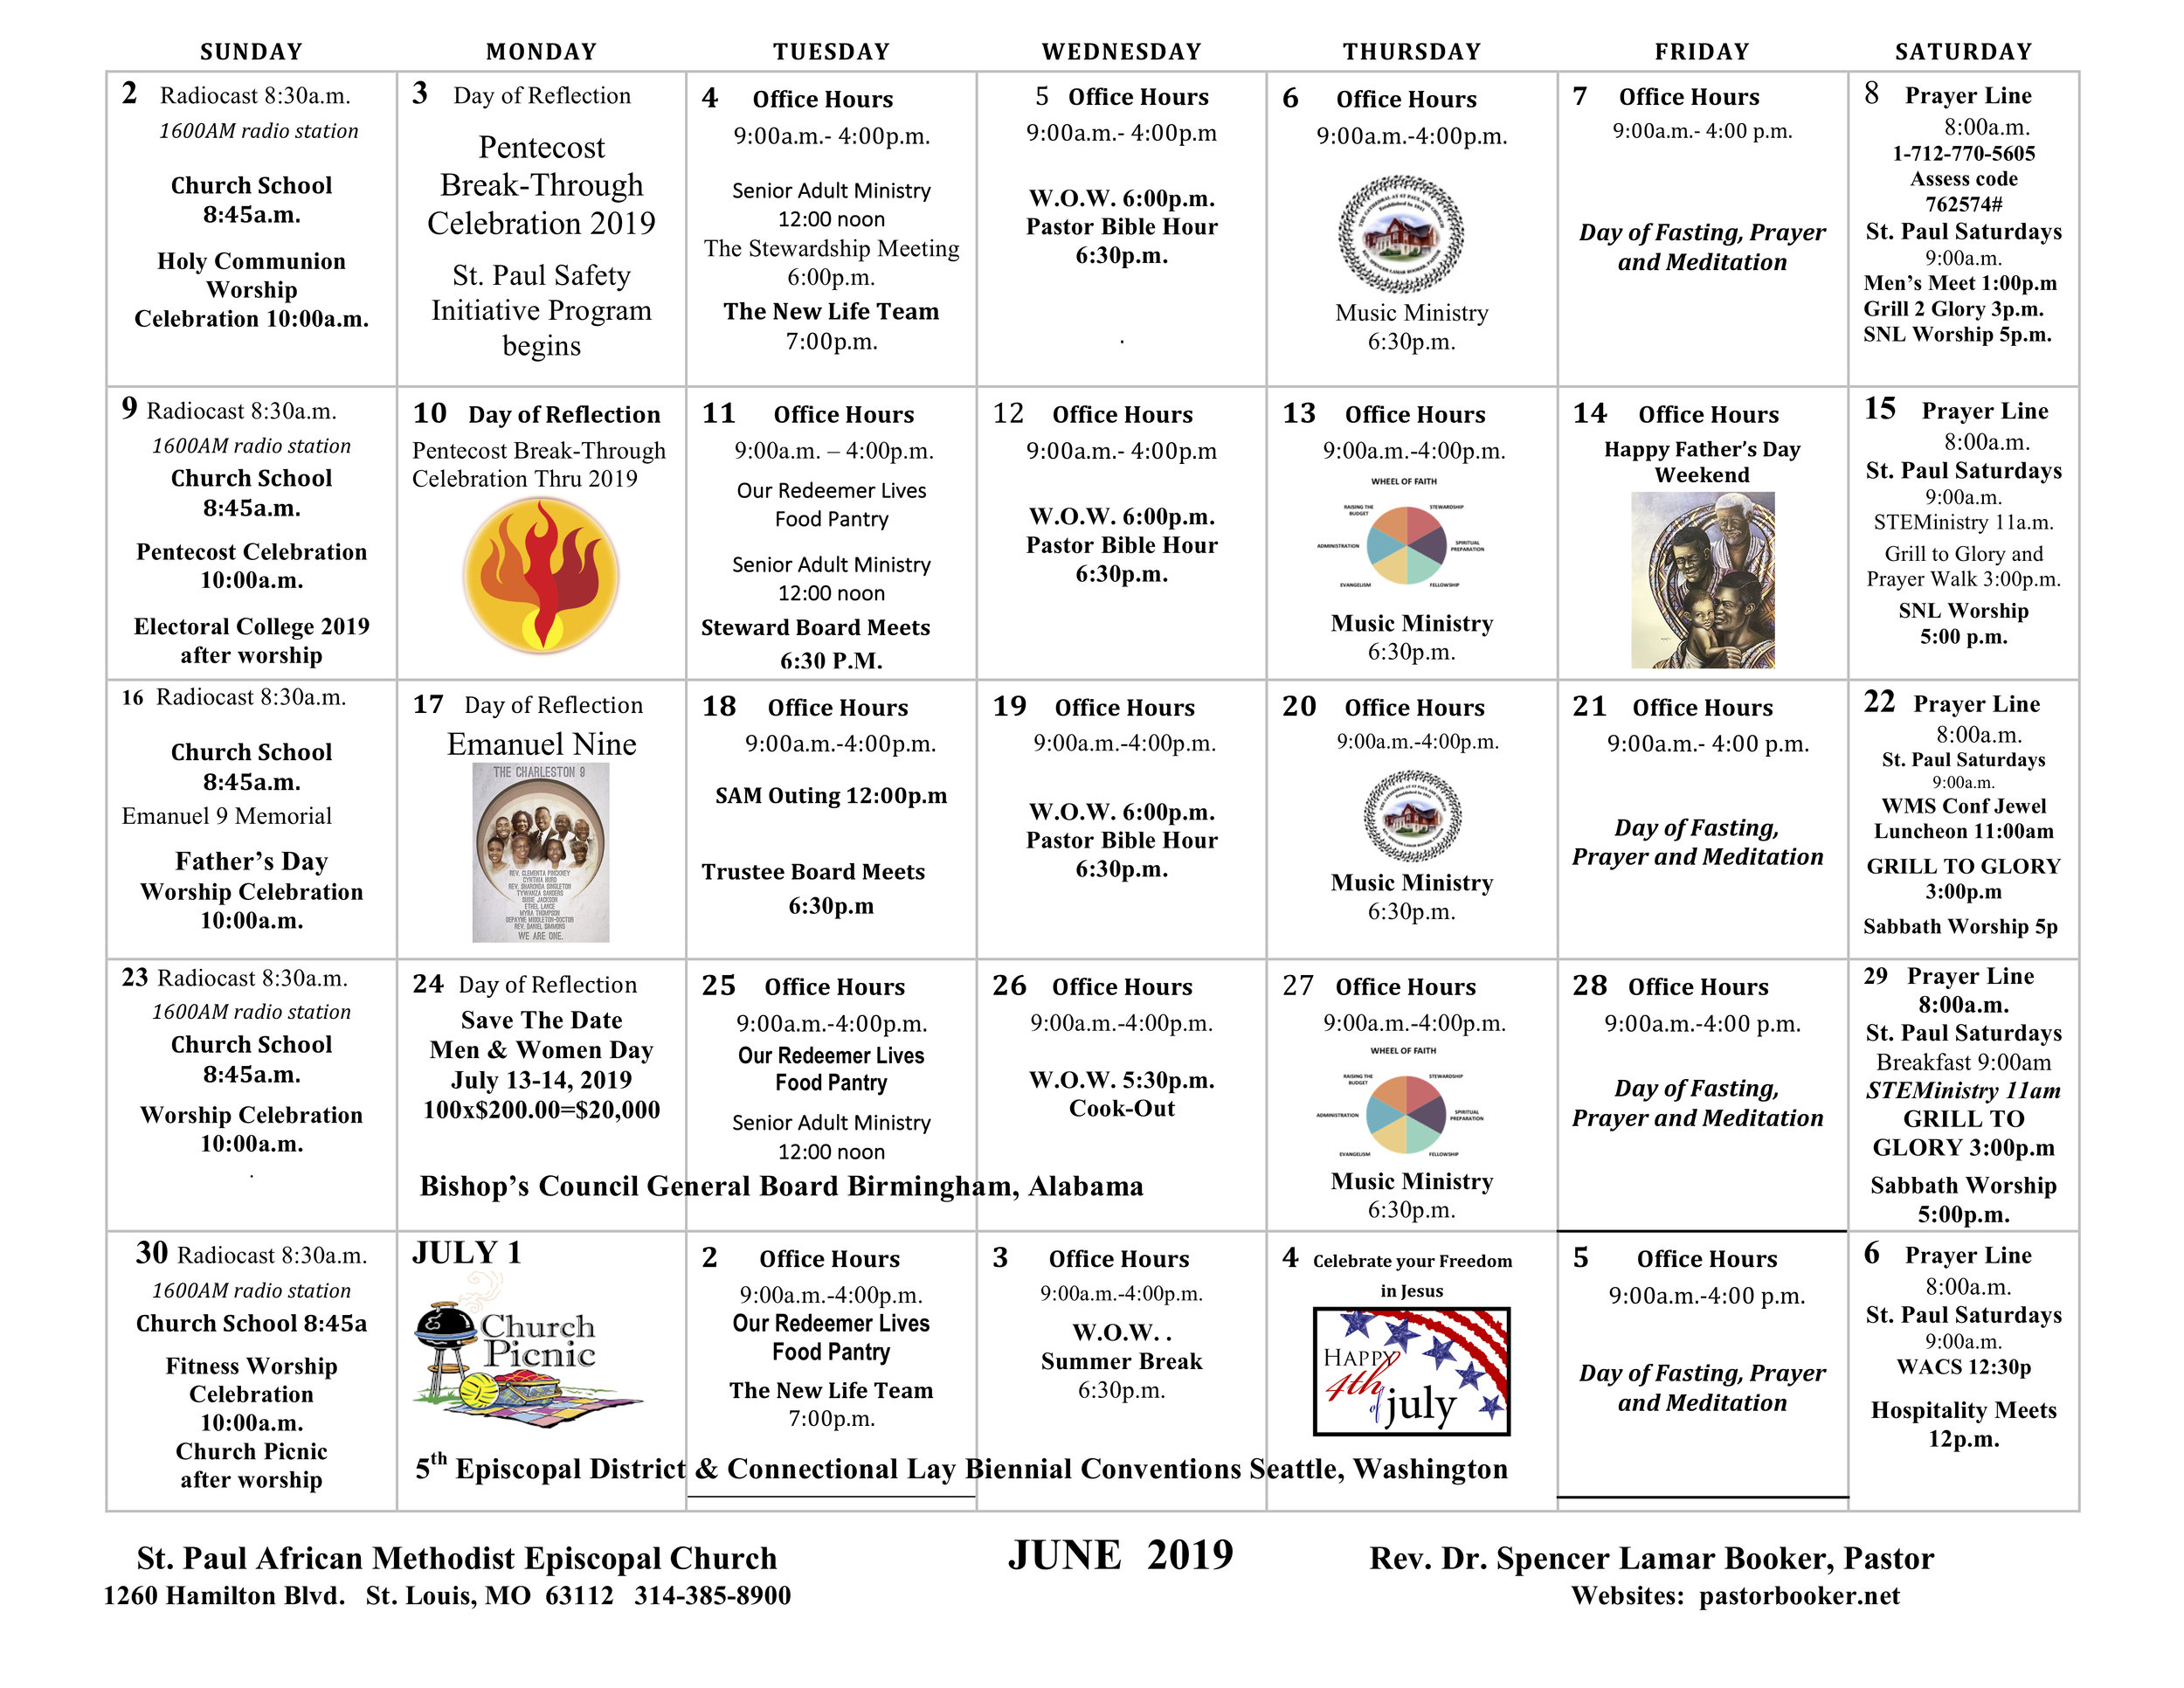 JUNE  Calendar 2019   docx.jpg